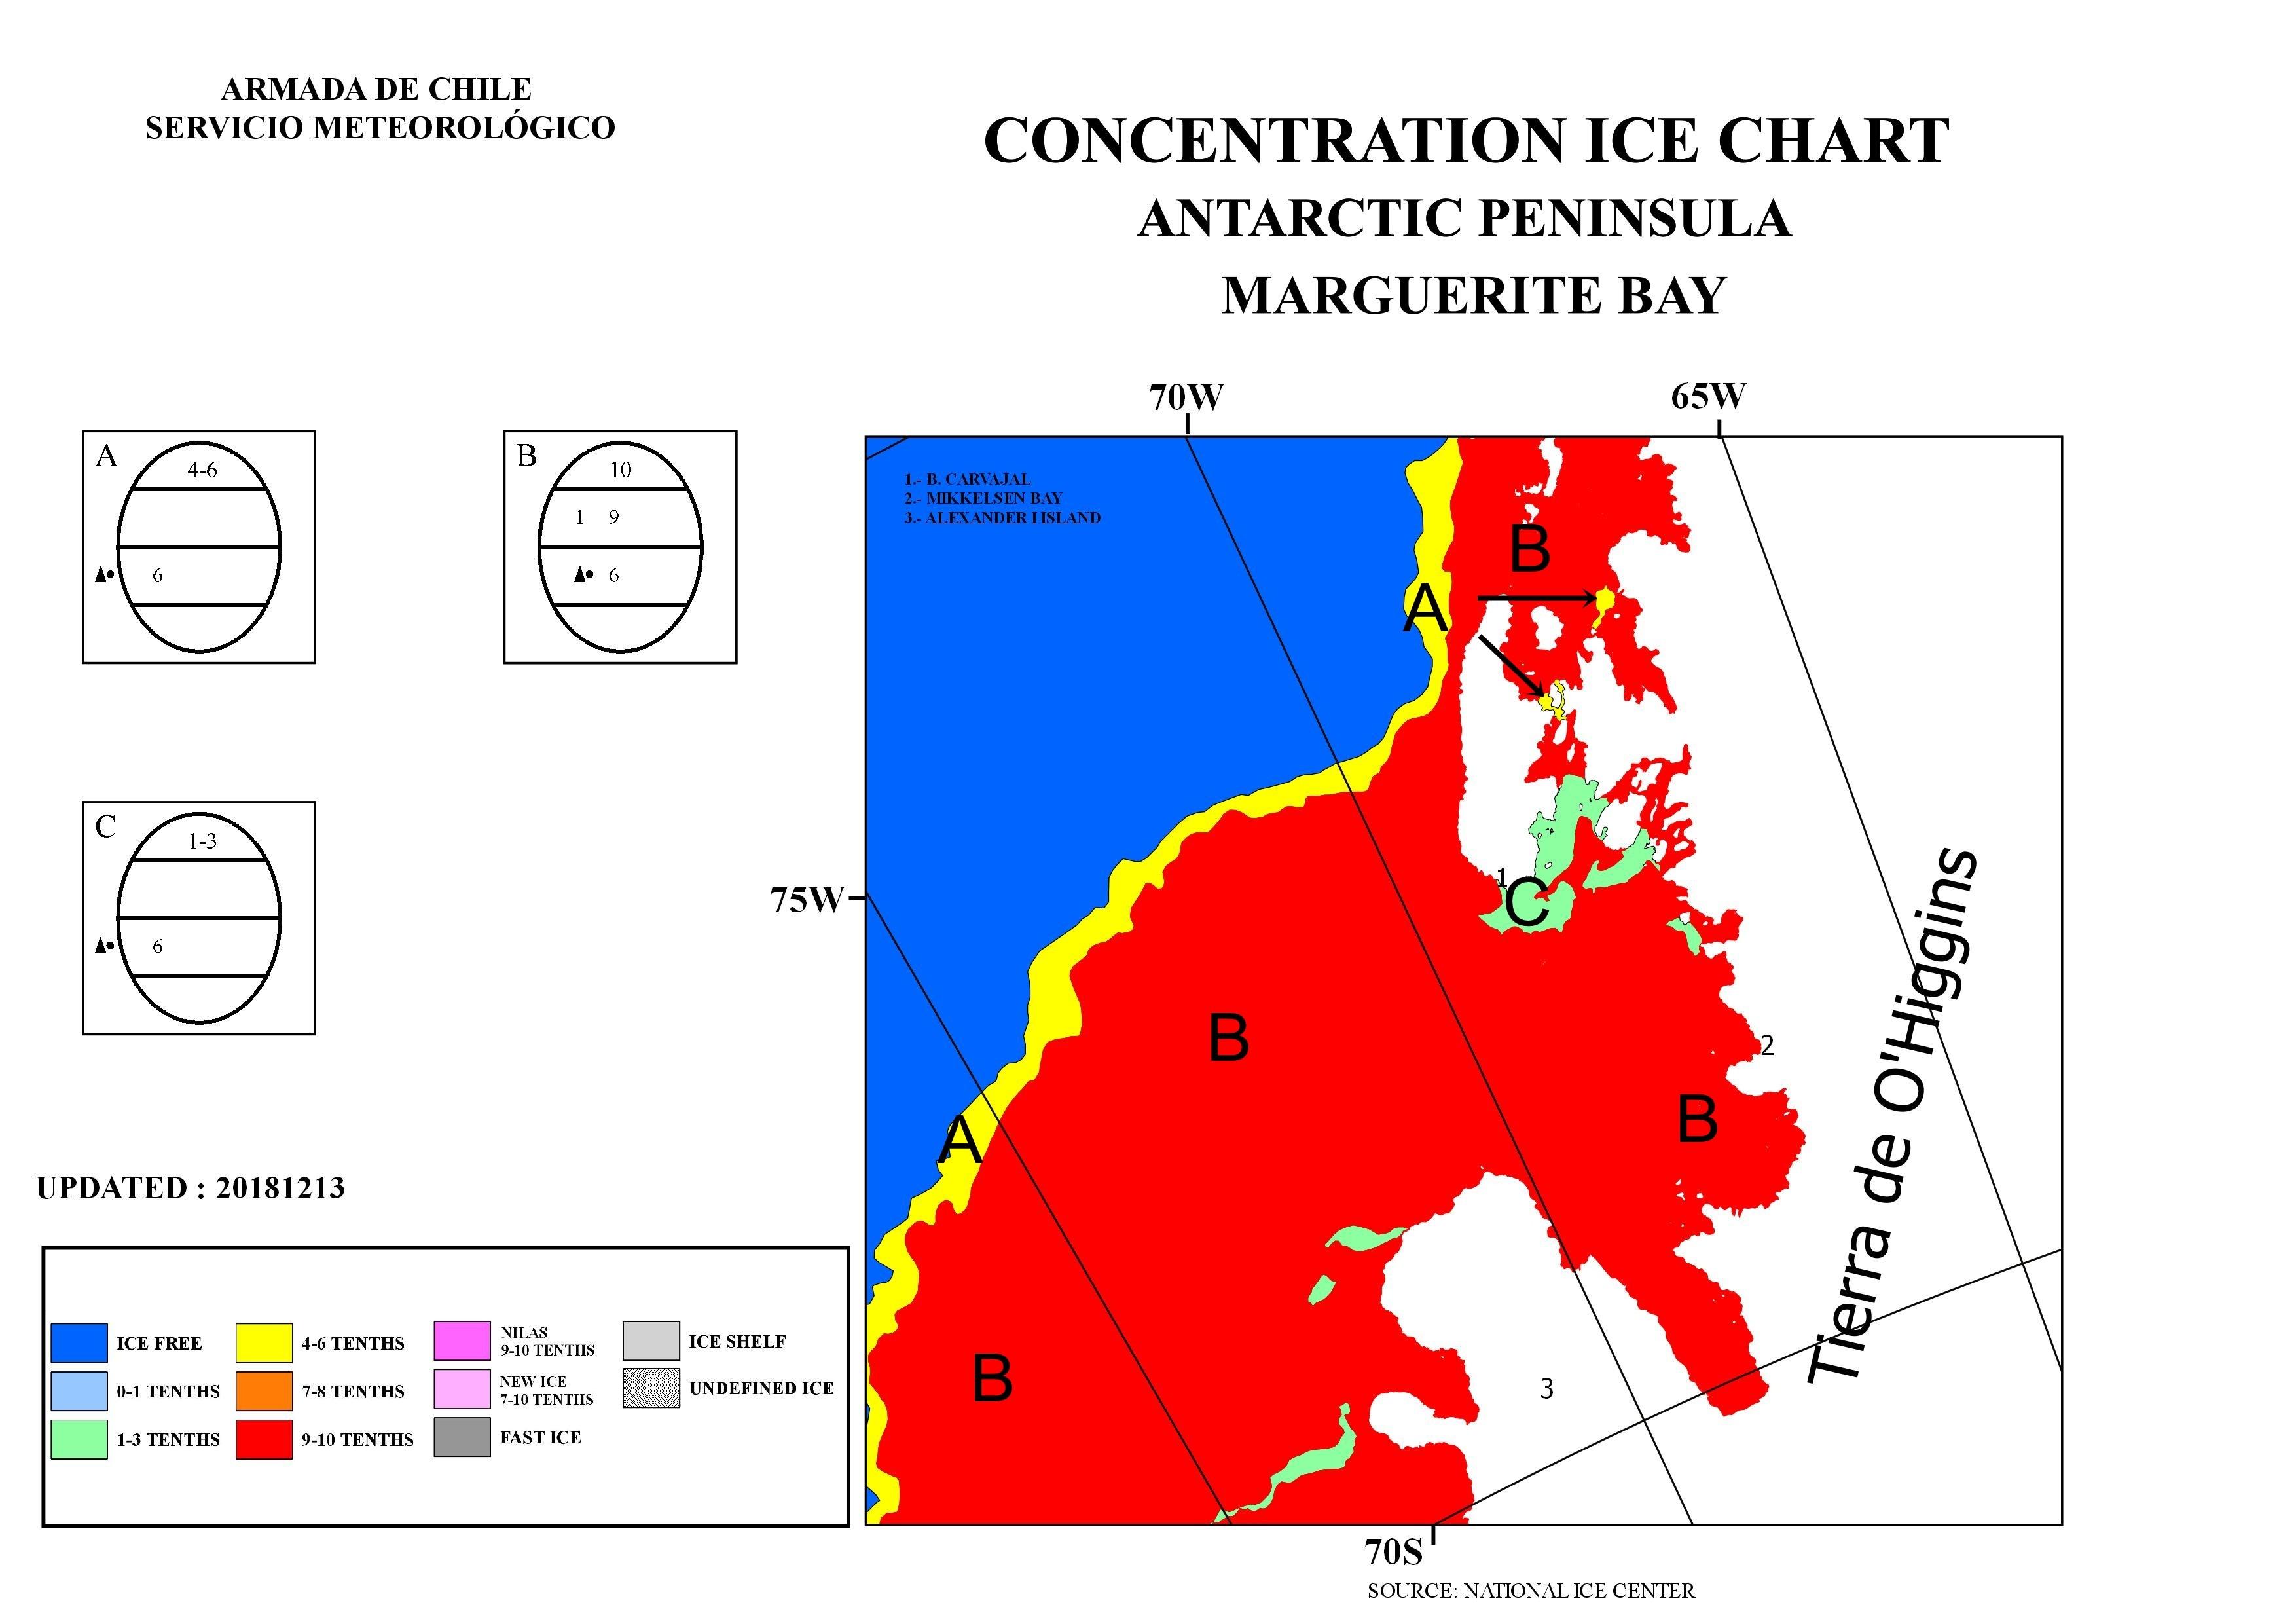 Nautical Free Free nautical charts & publications No image version